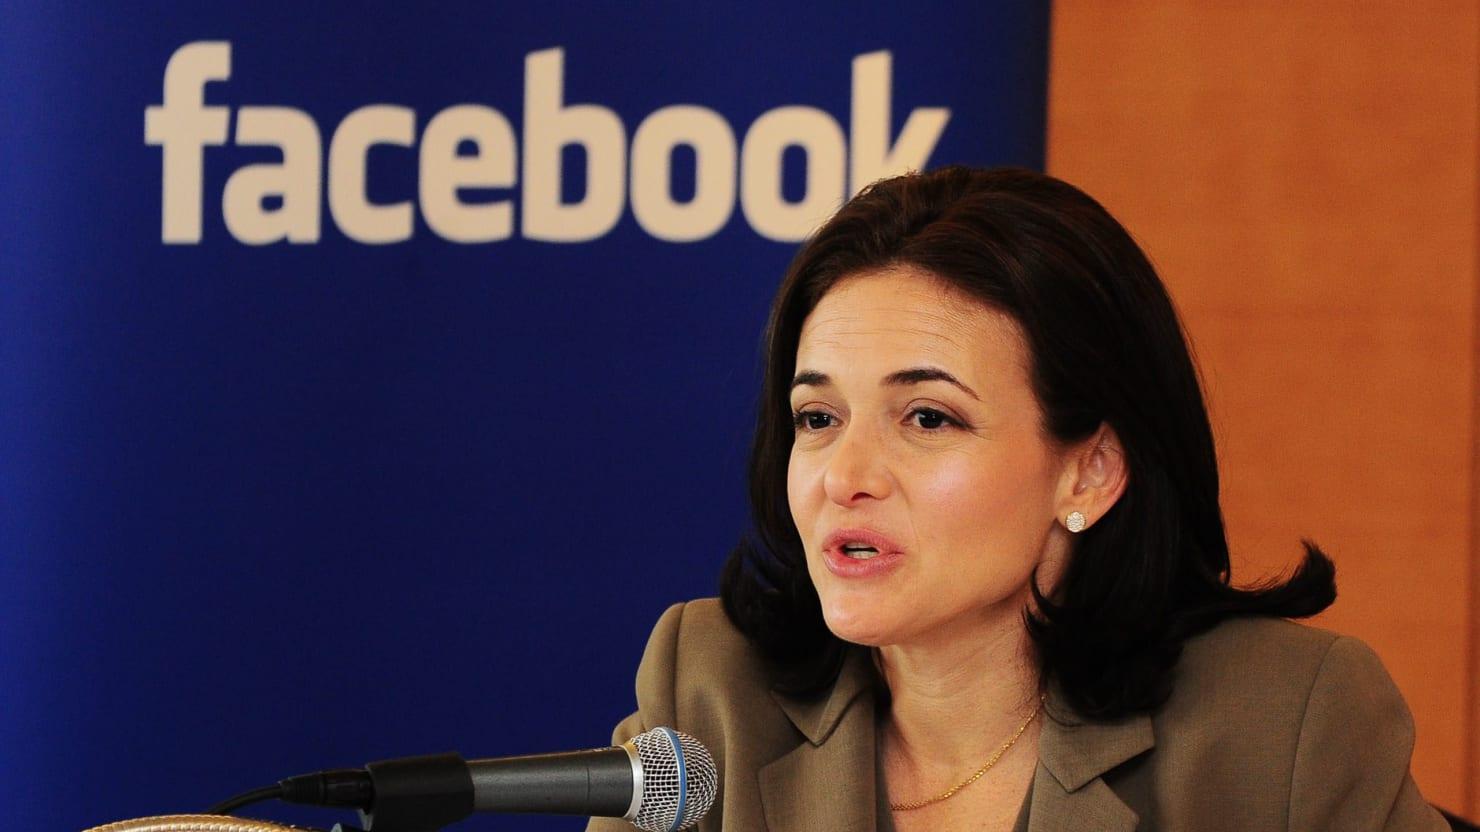 Image result for Facebook COO Sheryl Sandberg, photos